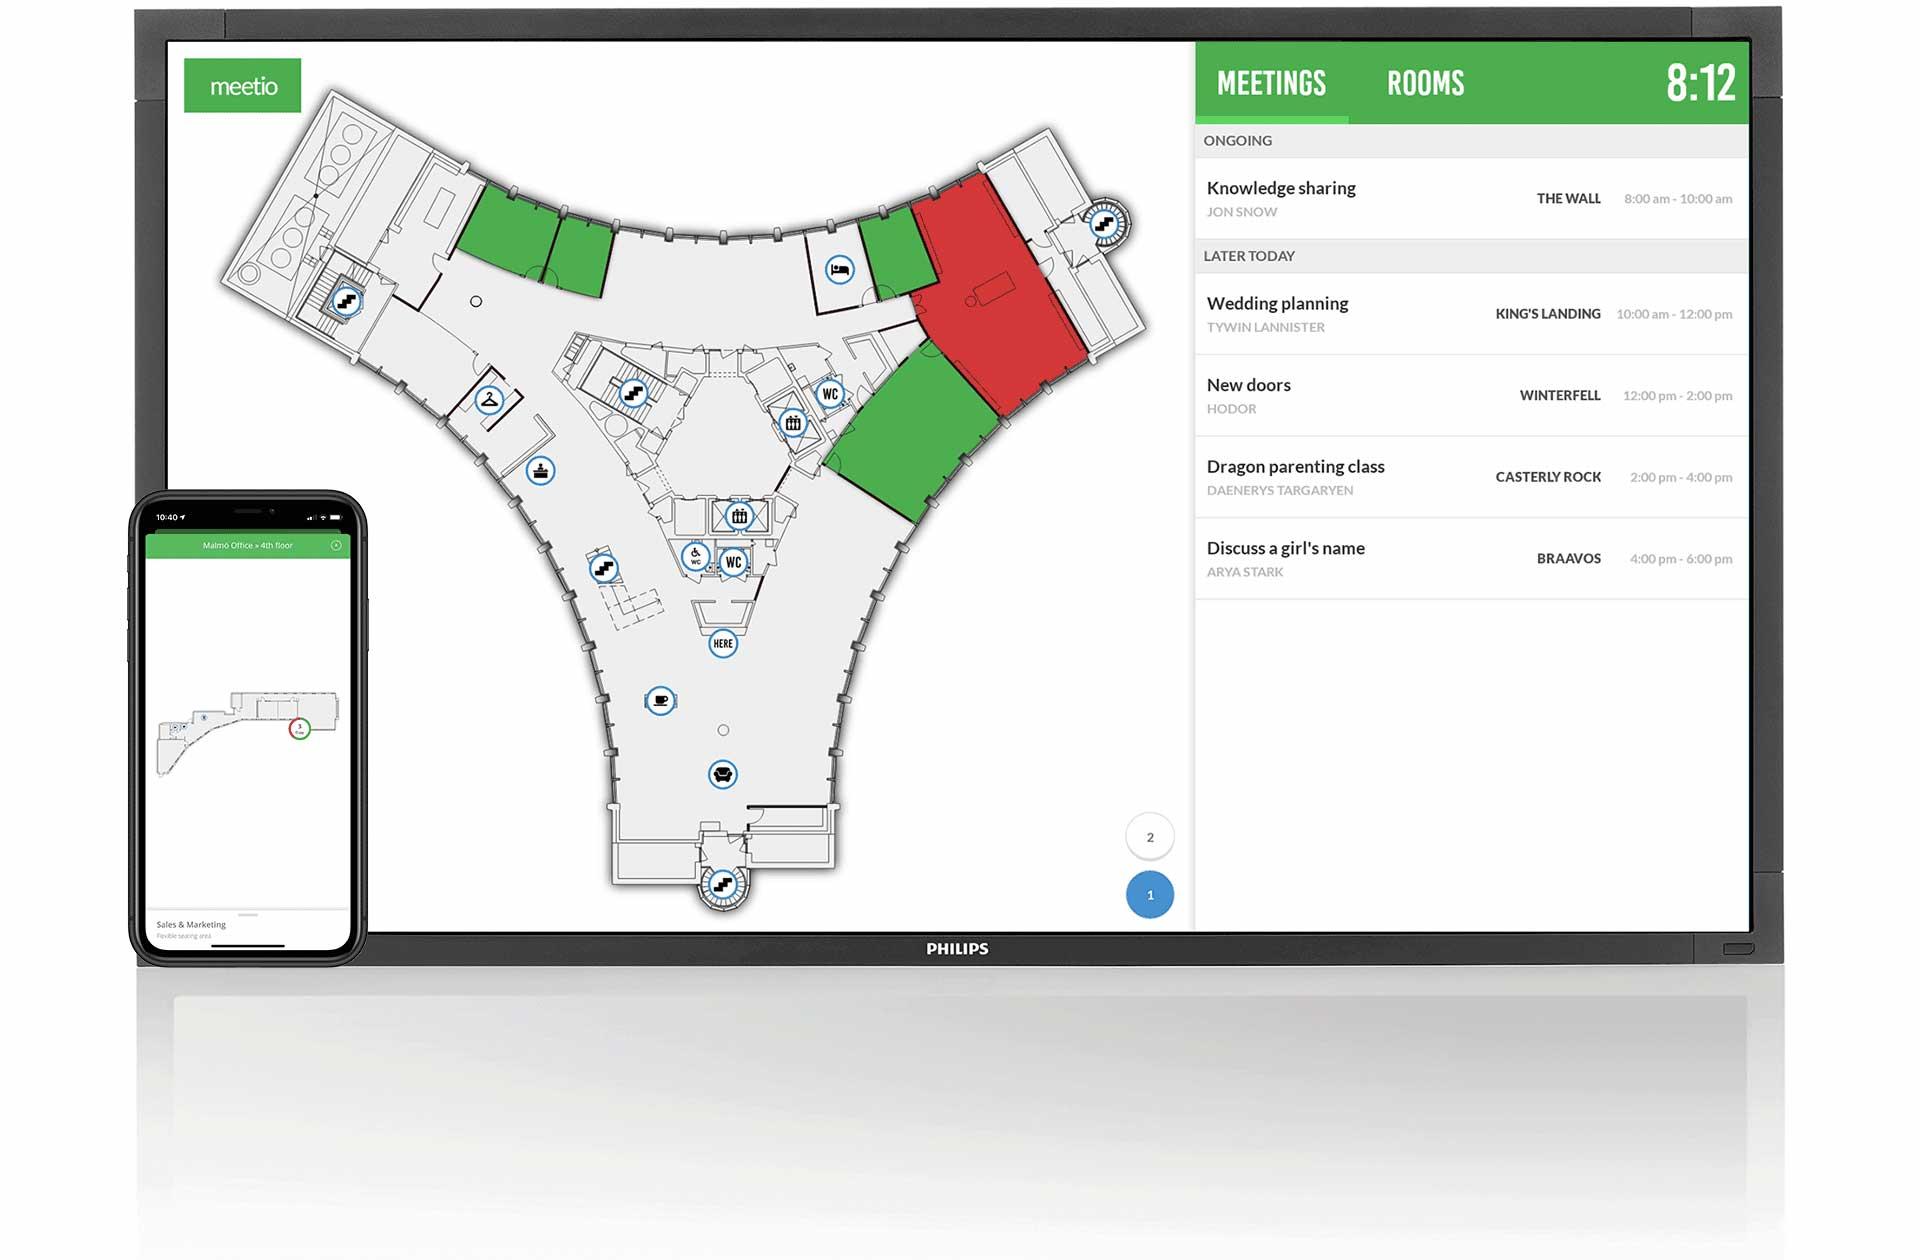 Meetio View with floor plan maps